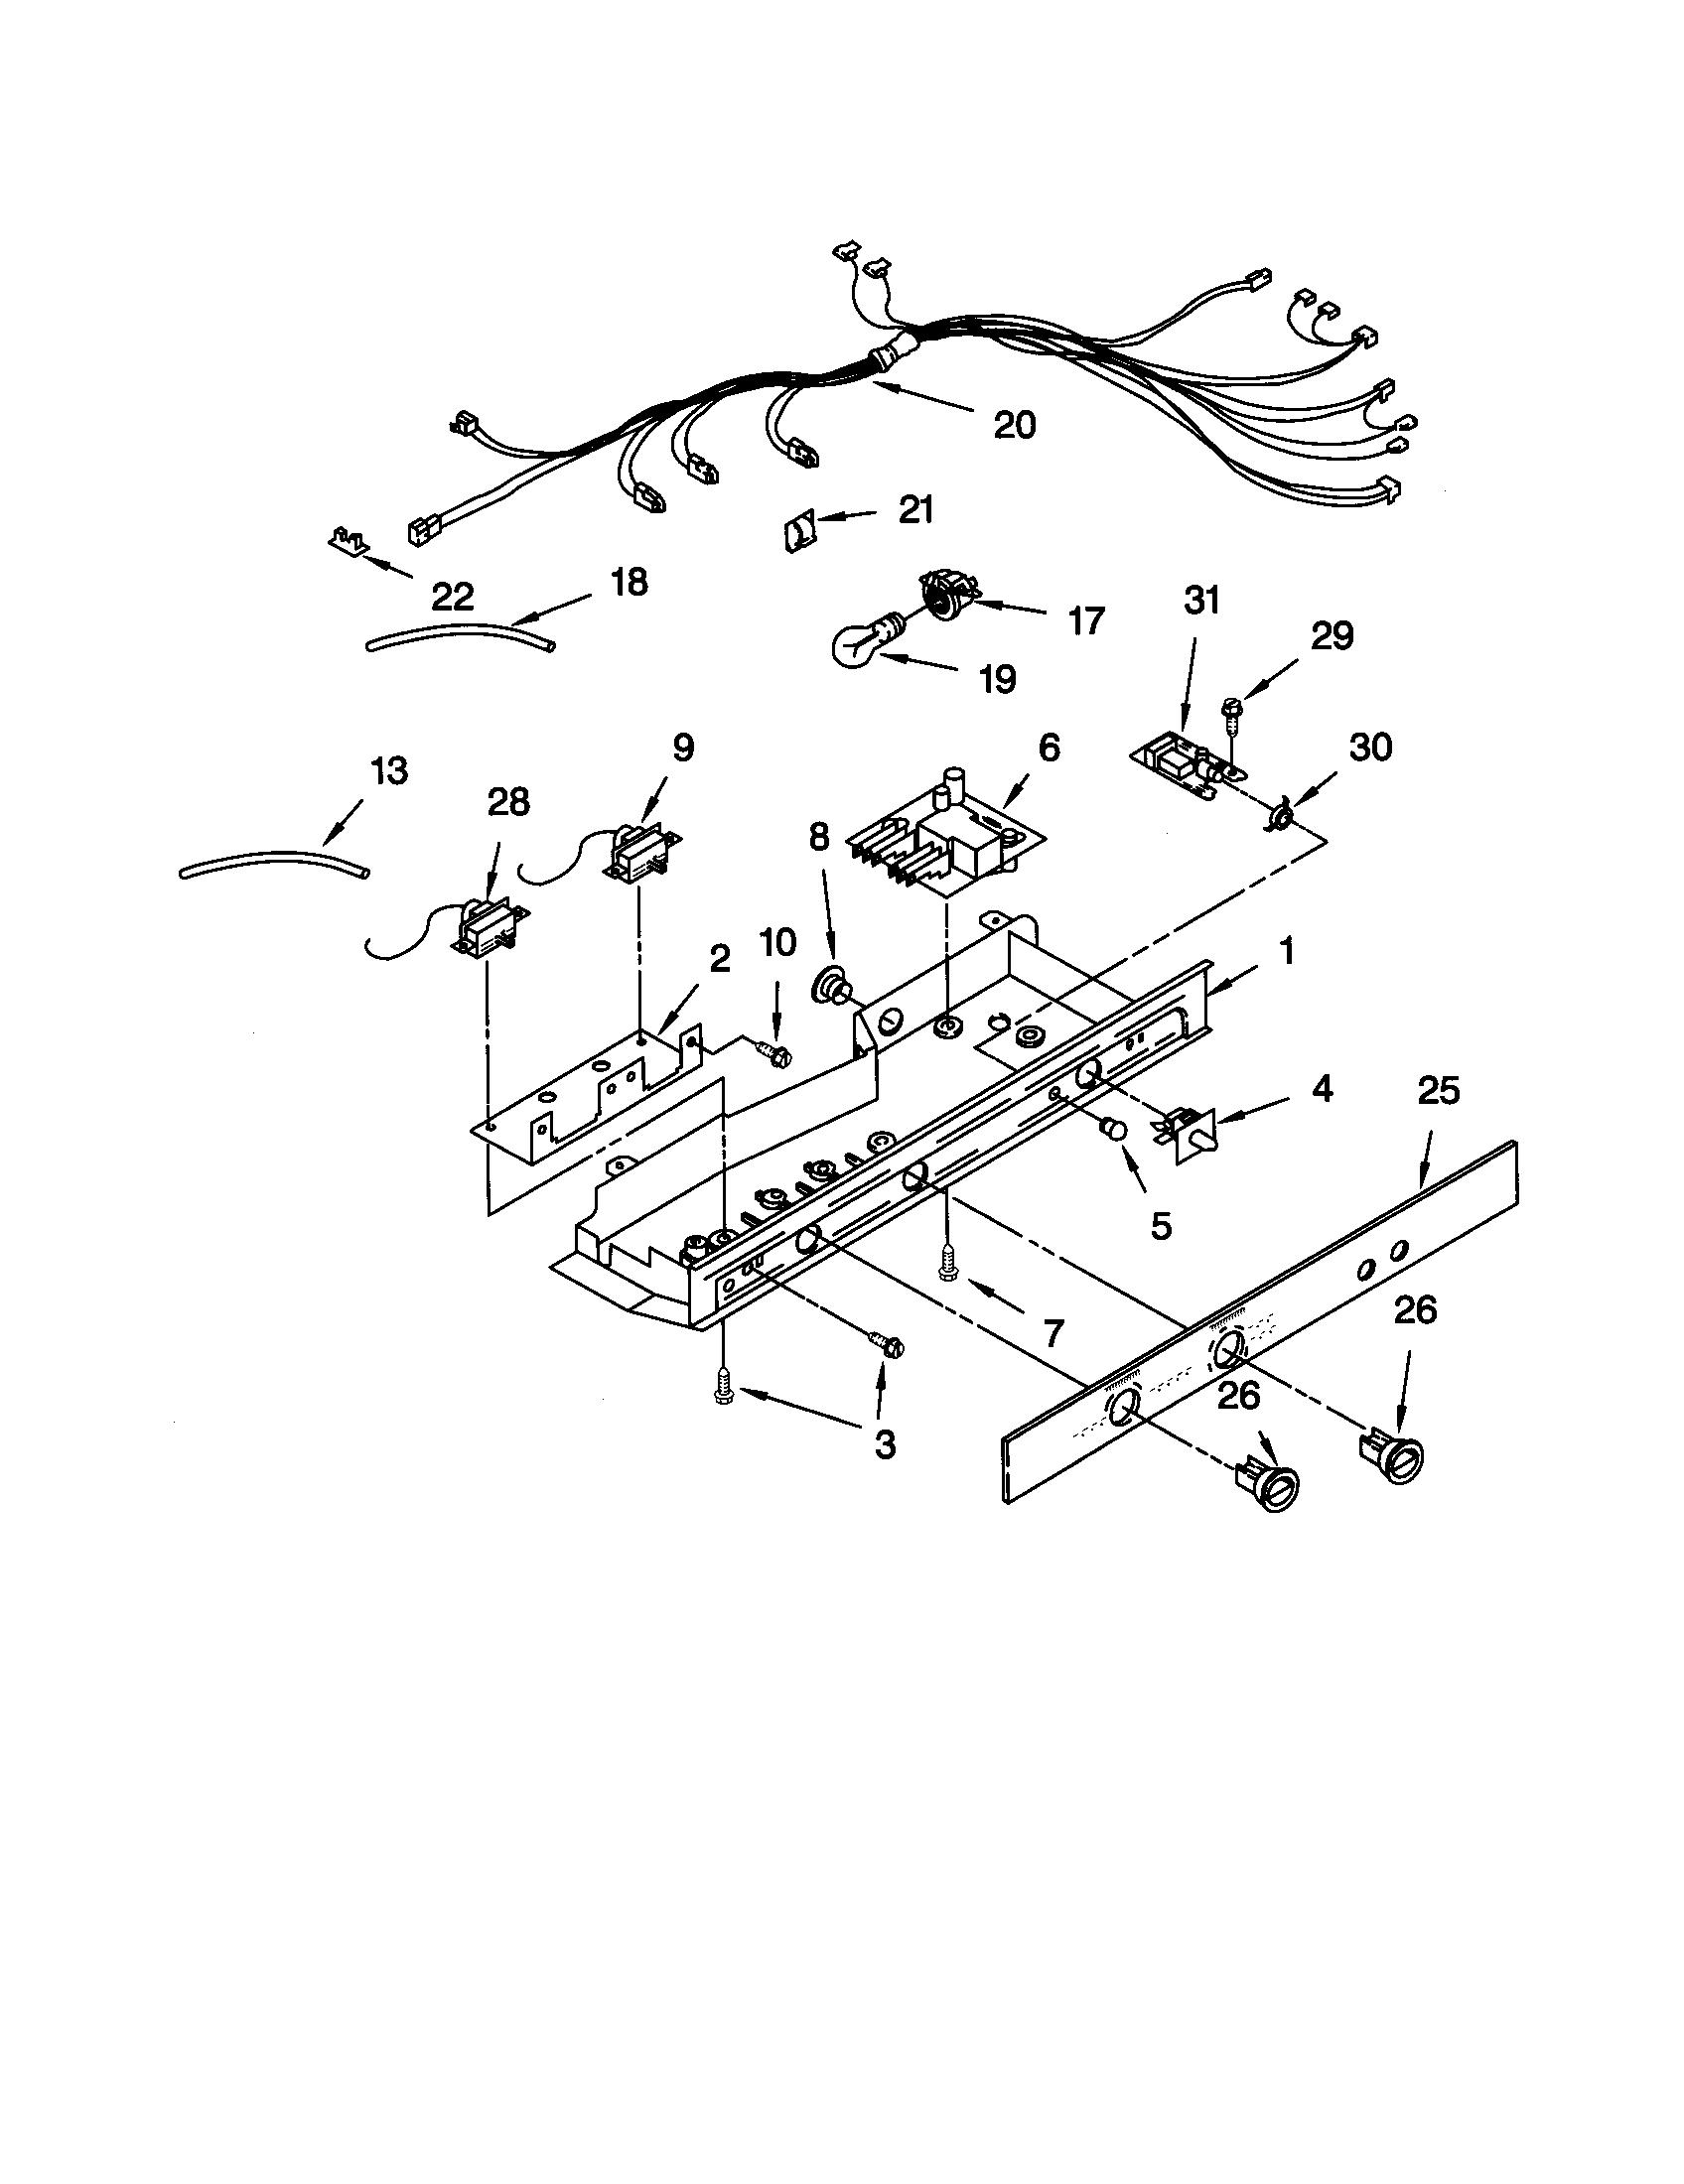 appliance wire harness